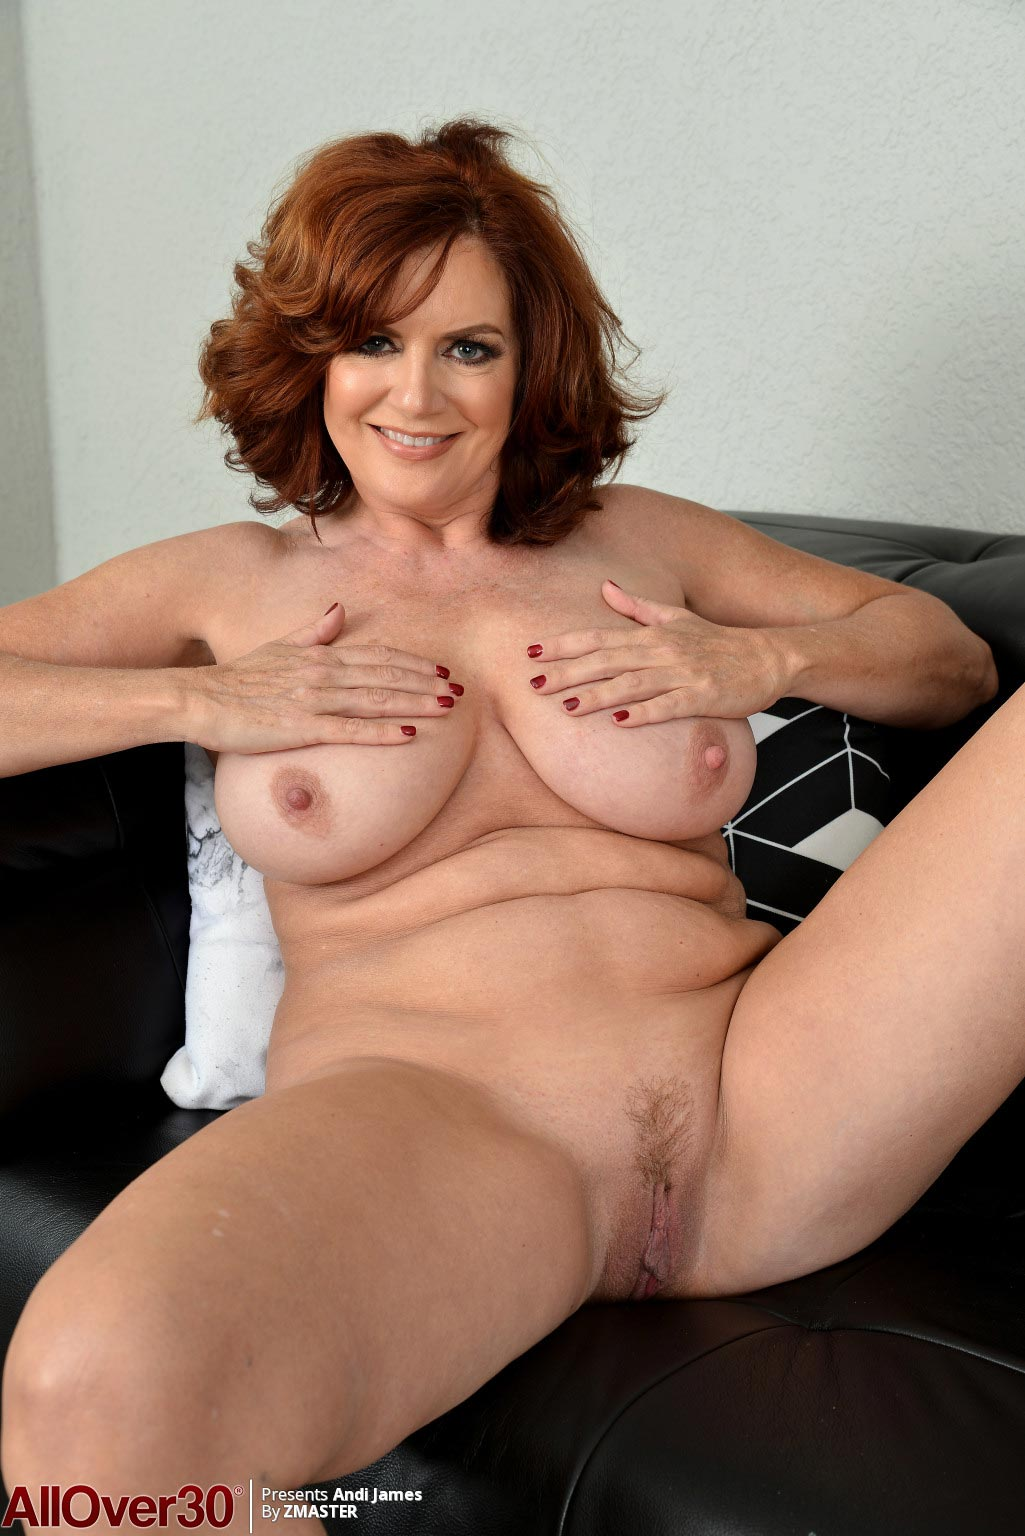 You busty redhead milf pornstar join. happens